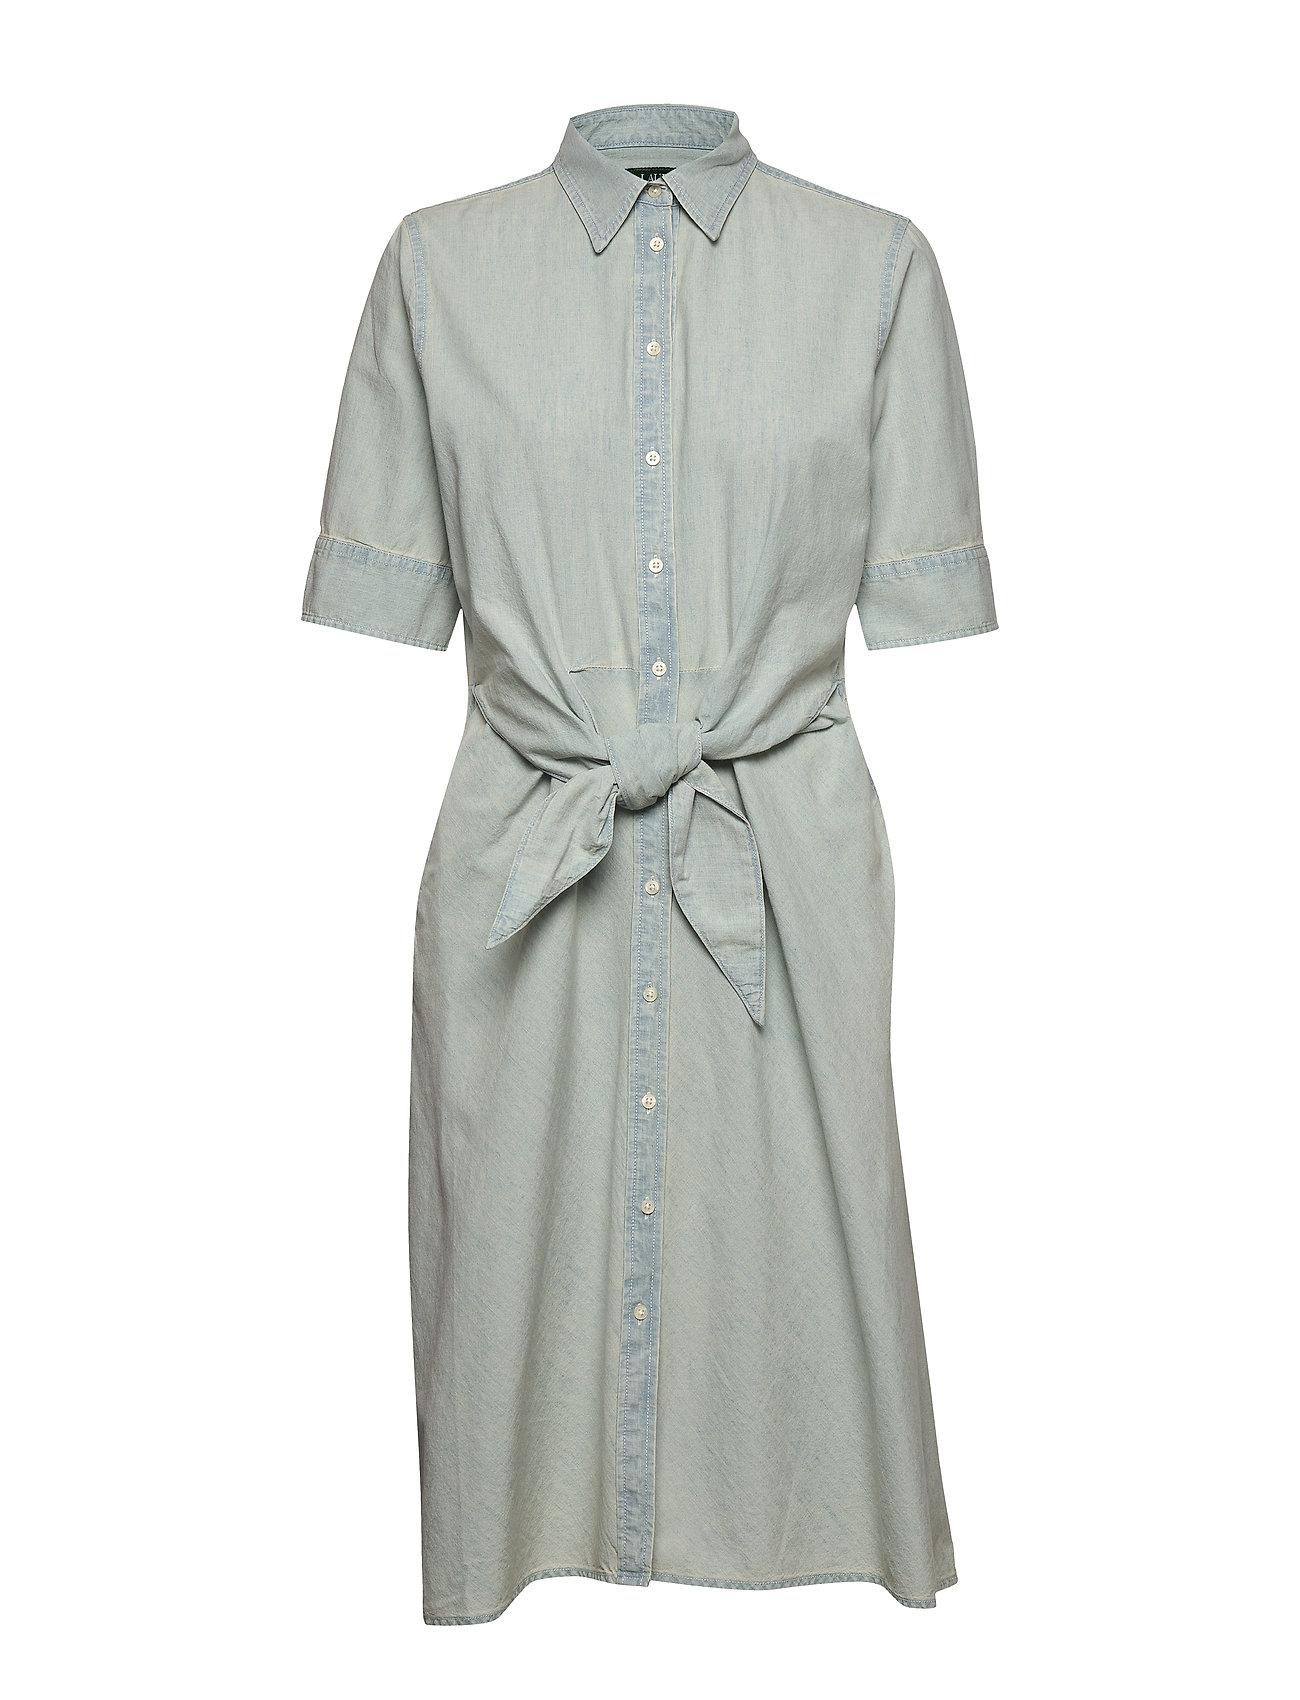 Lauren Ralph Lauren Chambray Shirtdress - VINTAGE CHAMBRAY